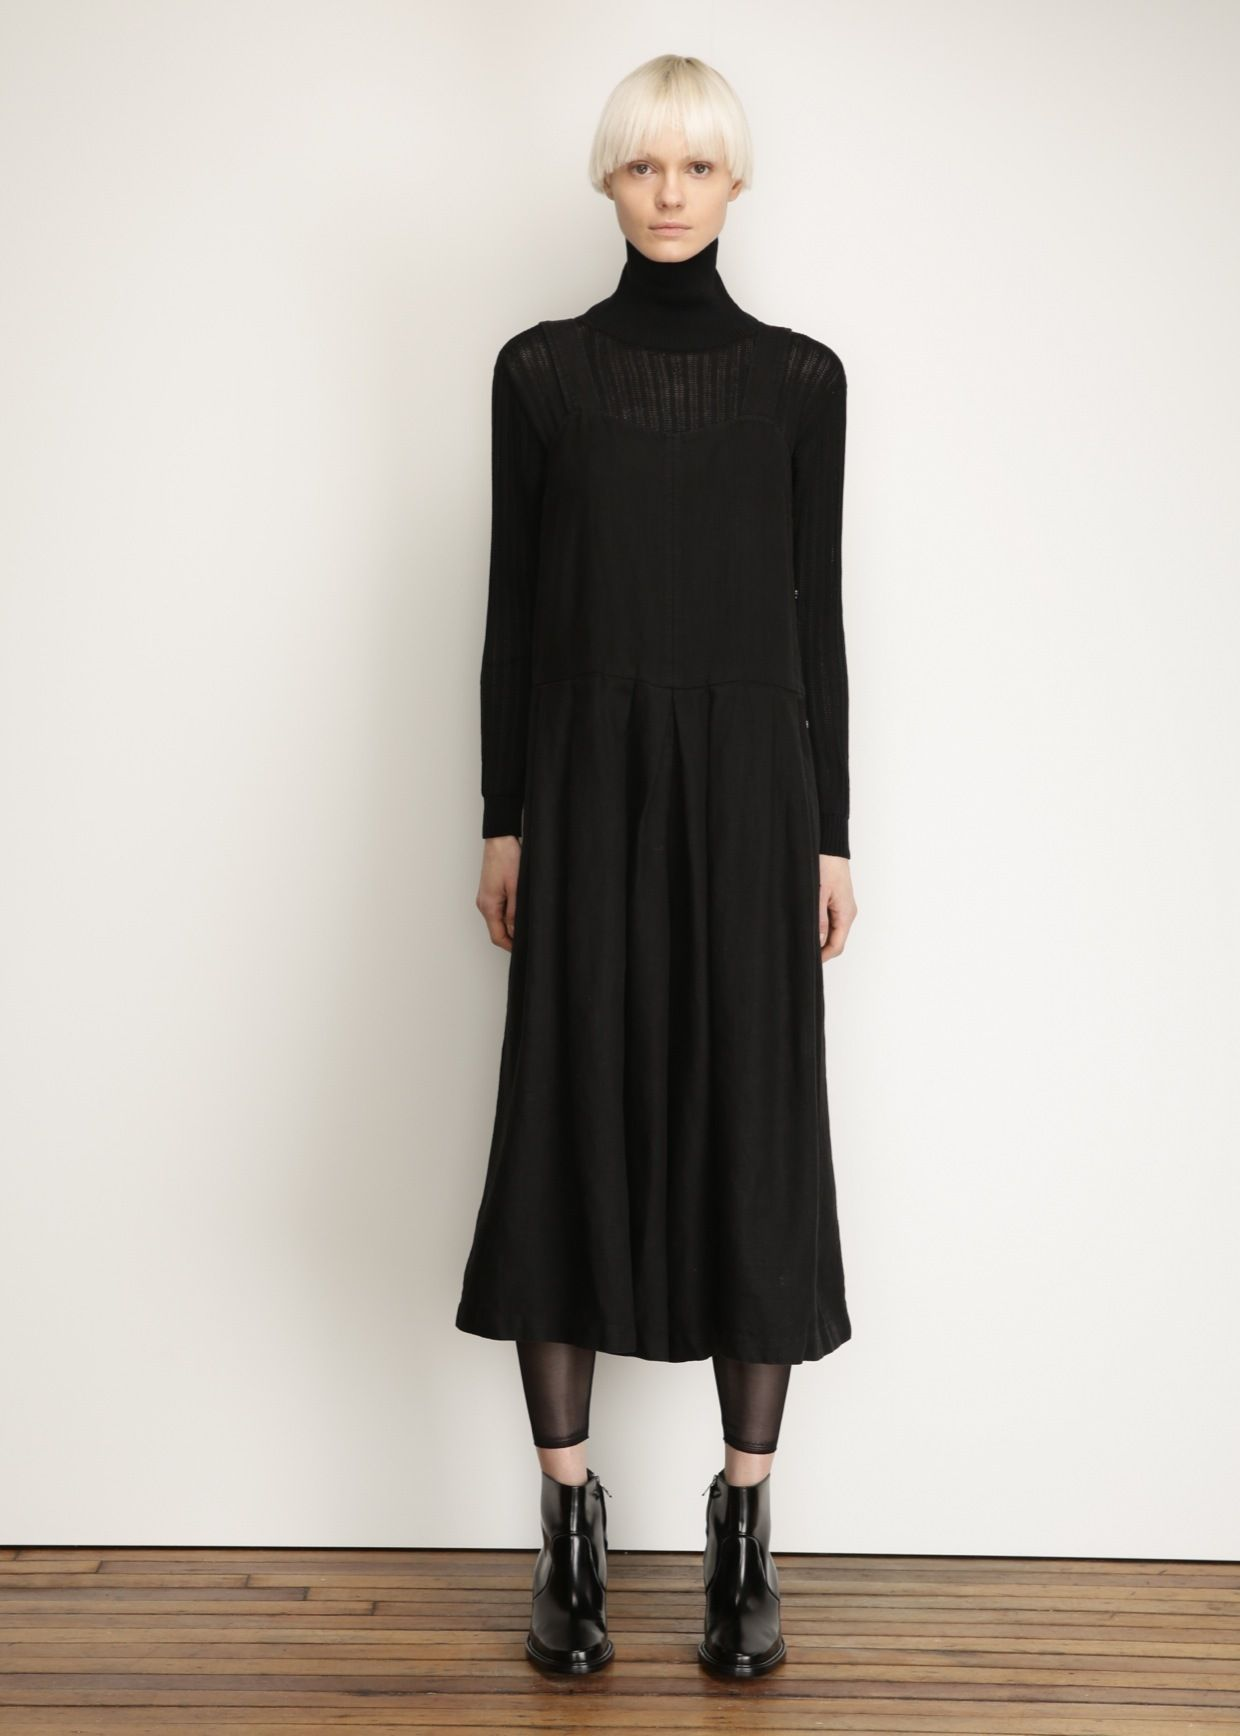 Totokaelo - Rachel Comey Black Exclusive Costello Suit